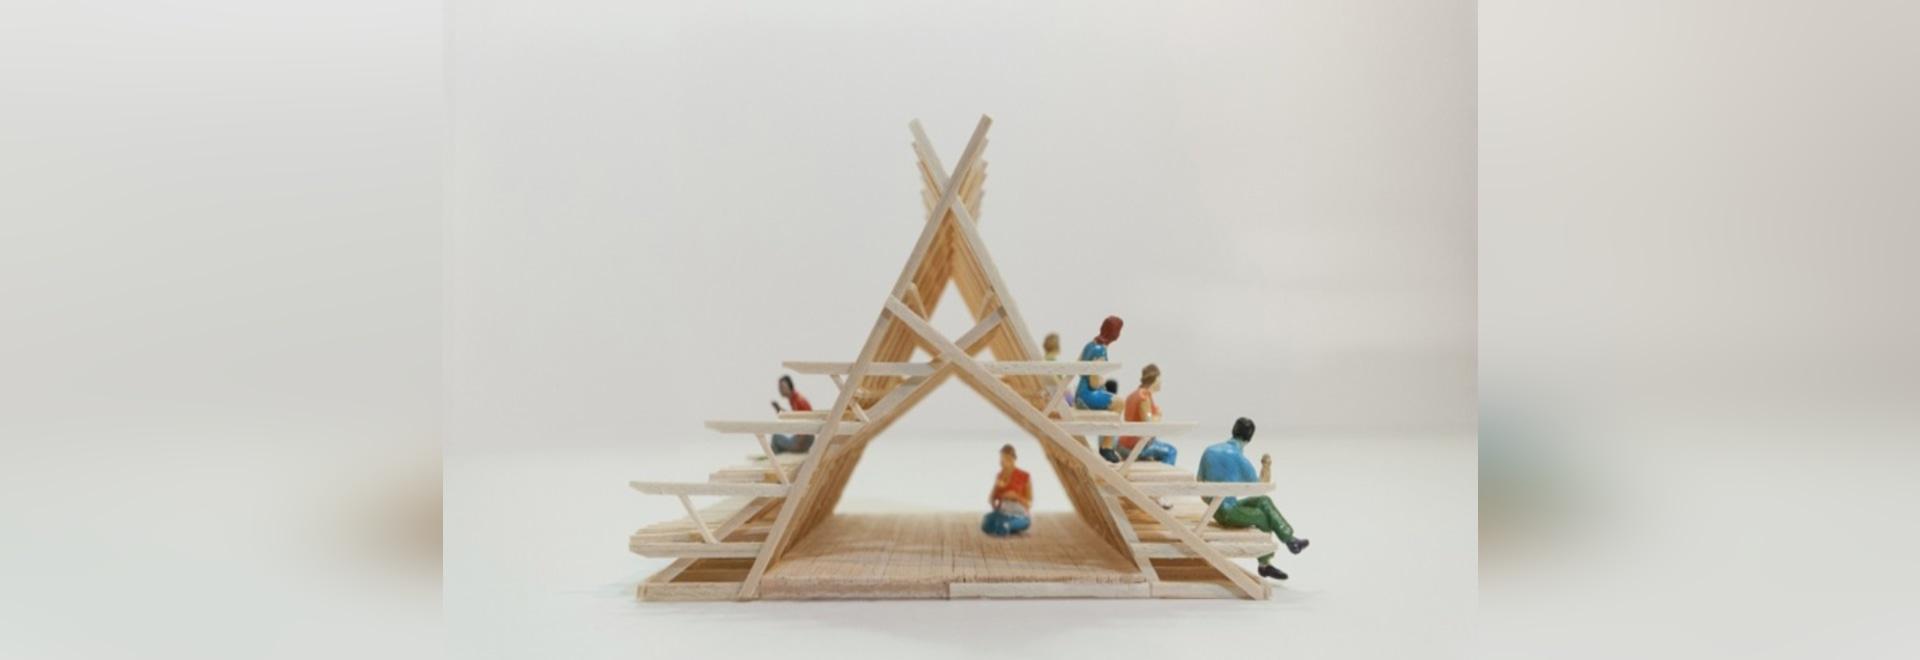 atelier bow-wow + didier faustino explore innovative habitats in paris exhibition